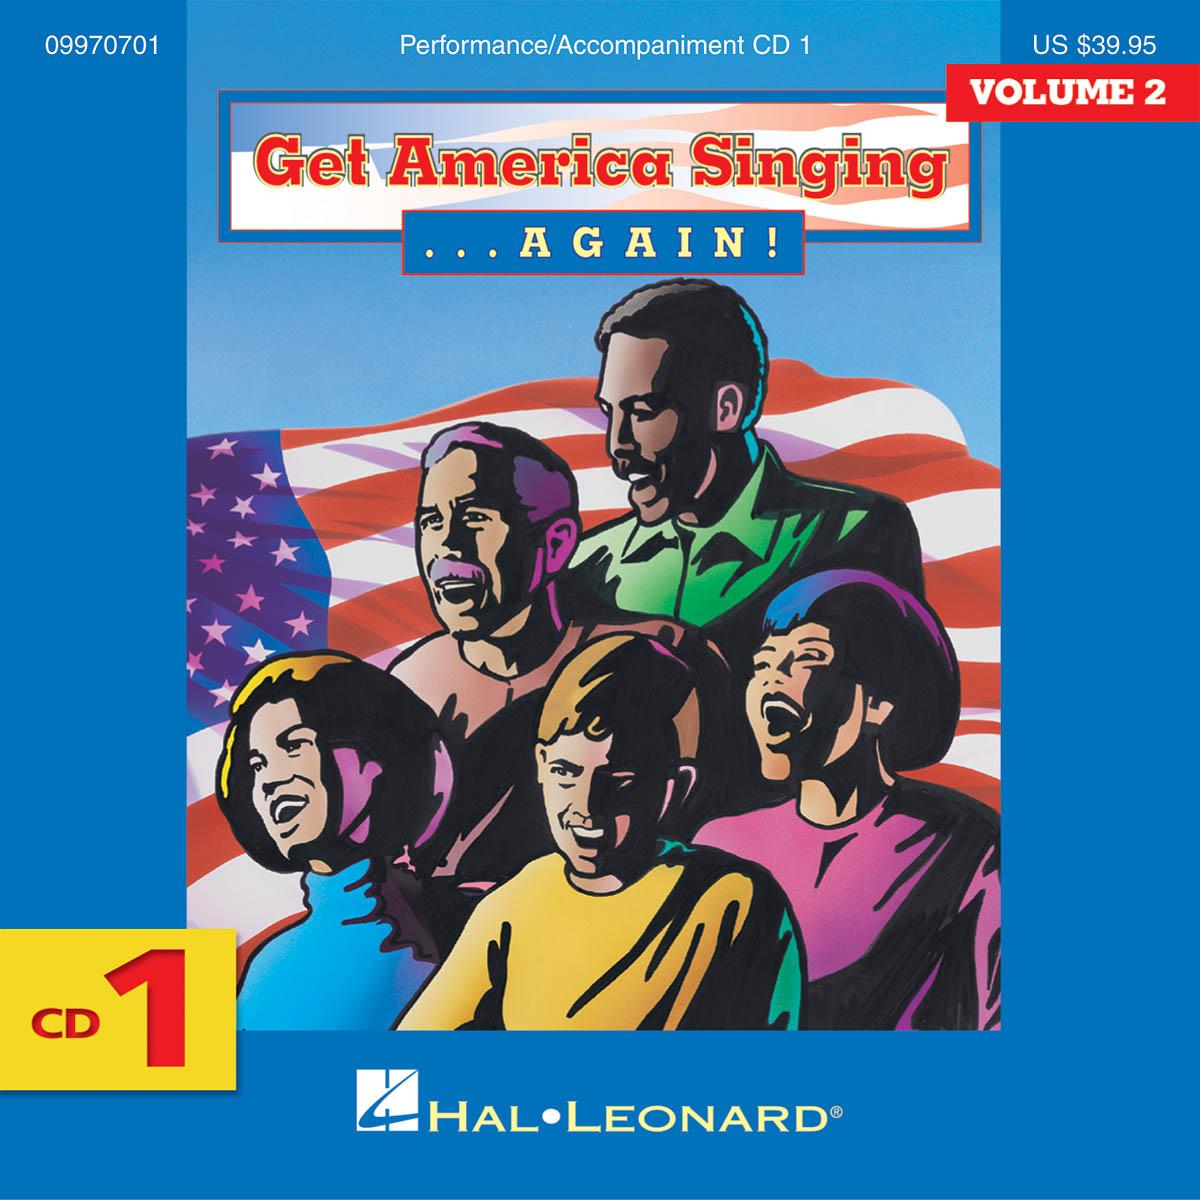 Get America Singing Again Vol 2 CD One: Mixed Choir: CD